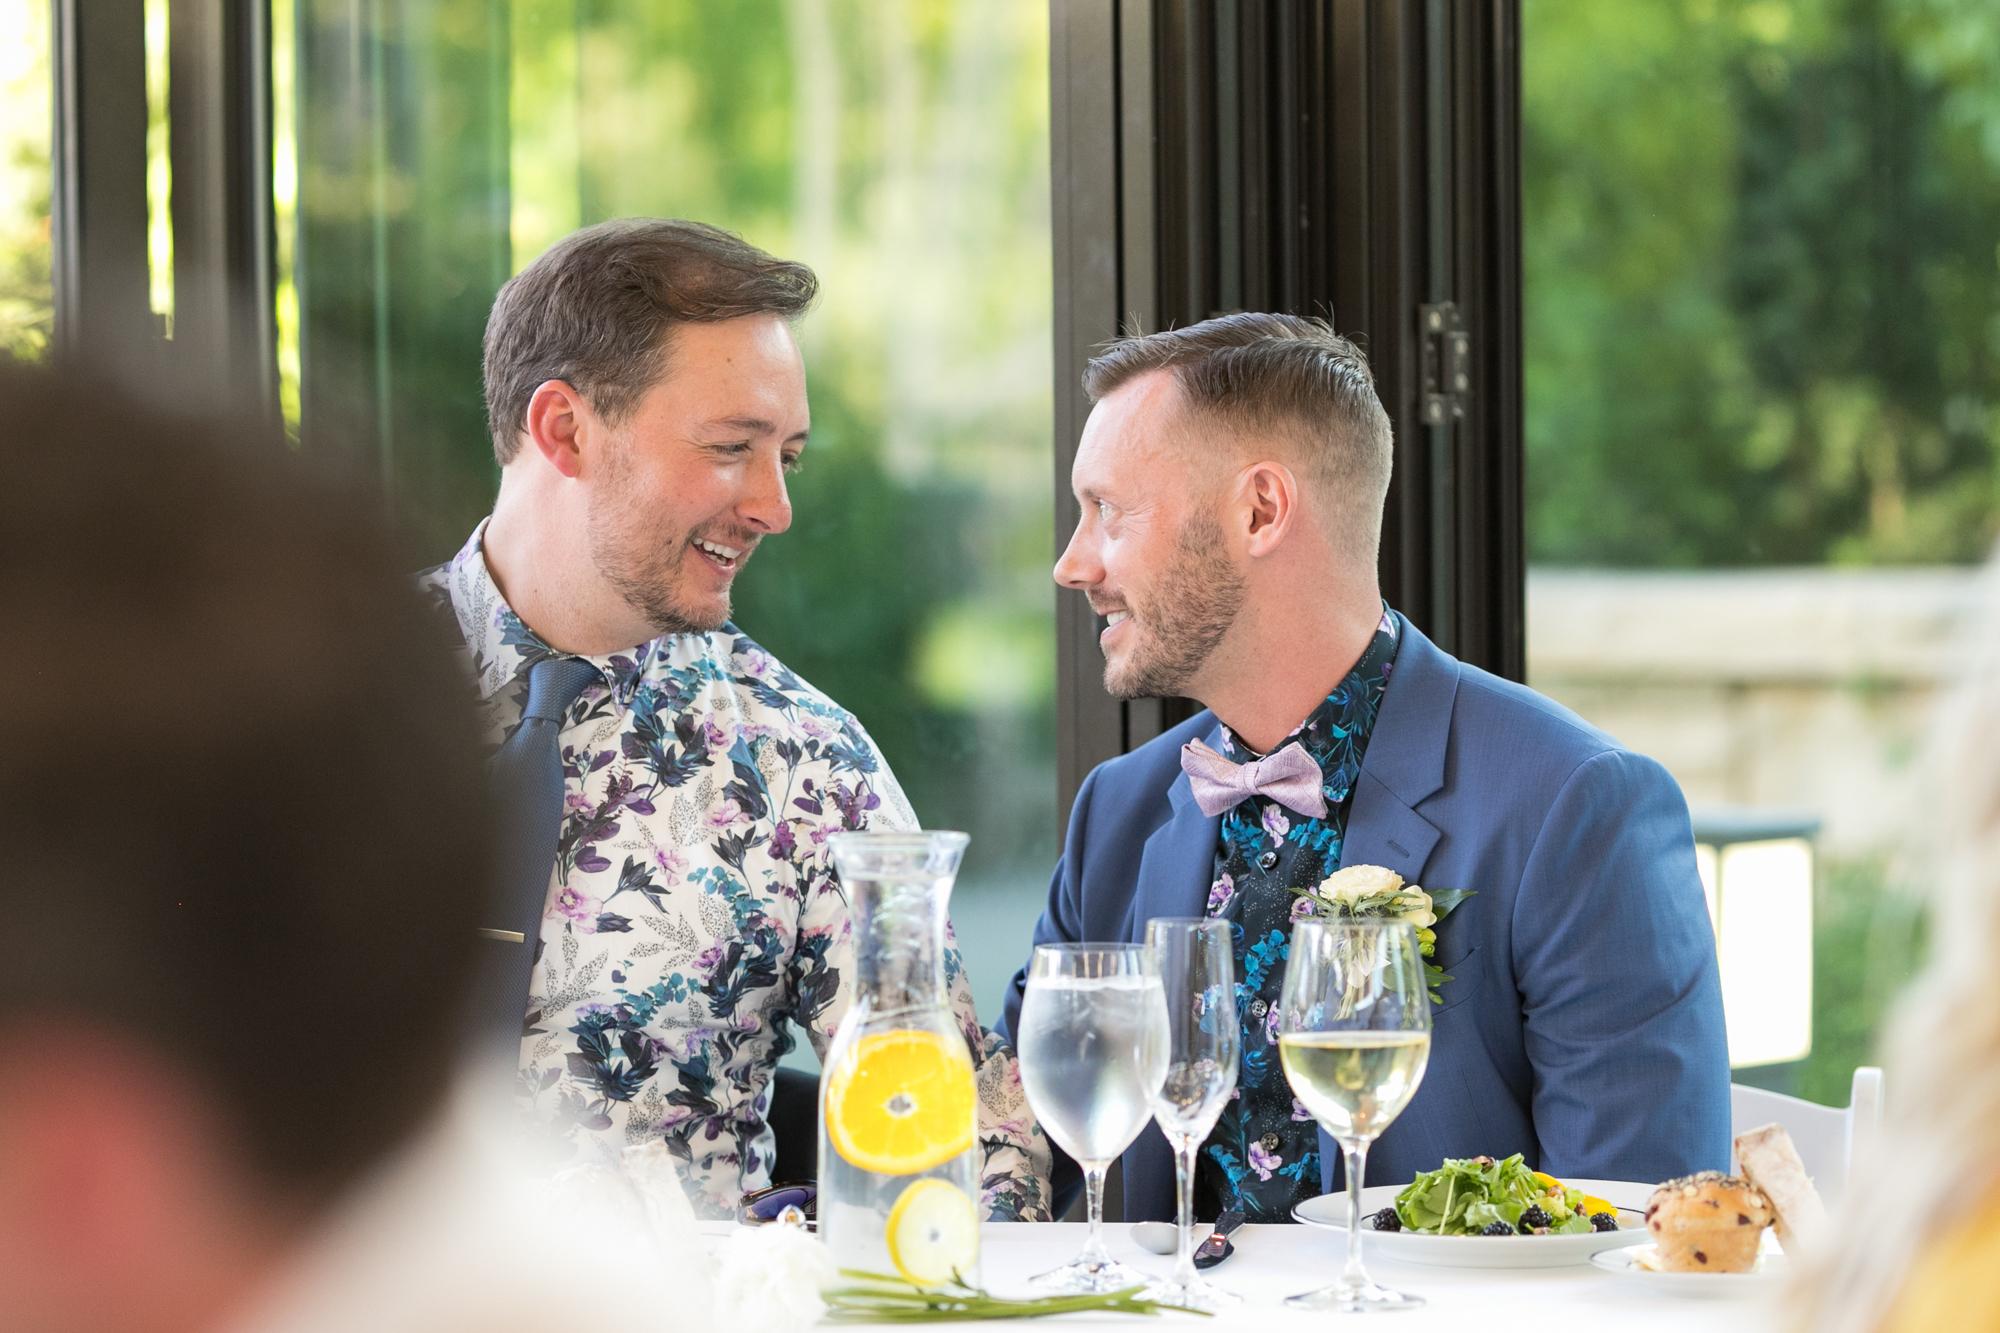 same-sex-wedding-red-butte-garden-37.jpg